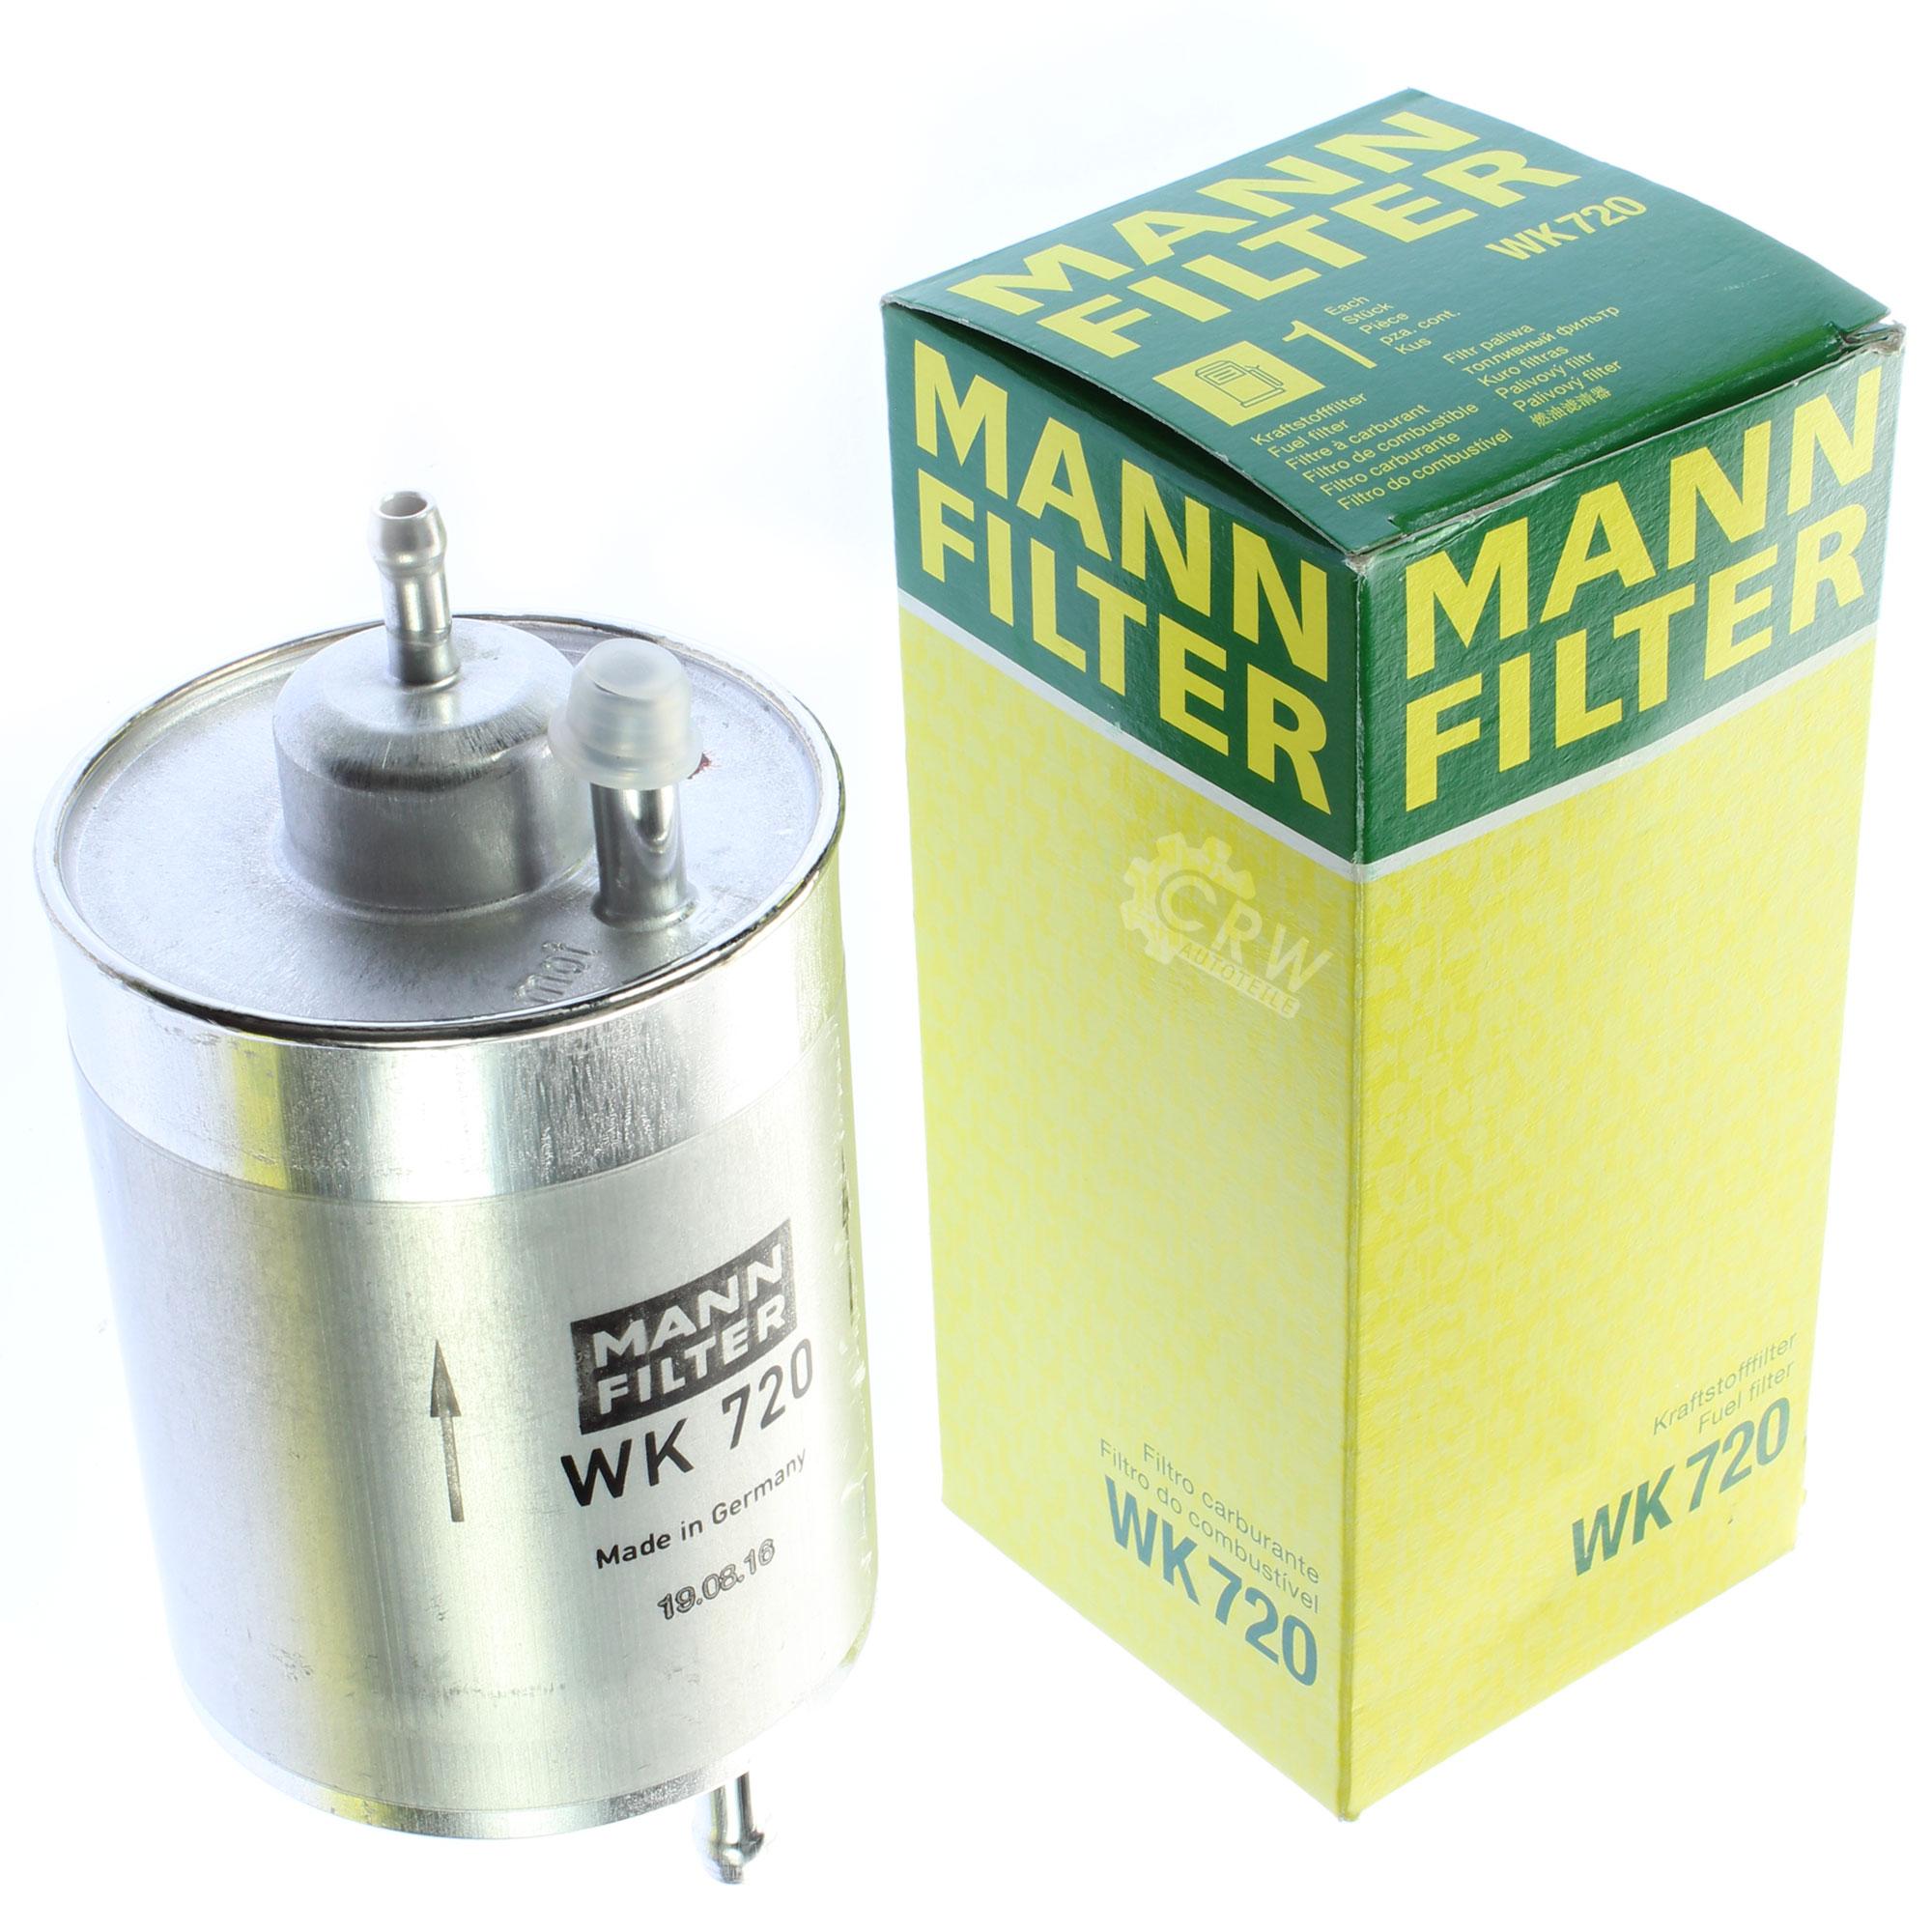 Motor-aceite-8l-MANNOL-Classic-10w-40-hombre-filtro-Filtro-paquete-Mercedes-Benz-CLK-c208 miniatura 9